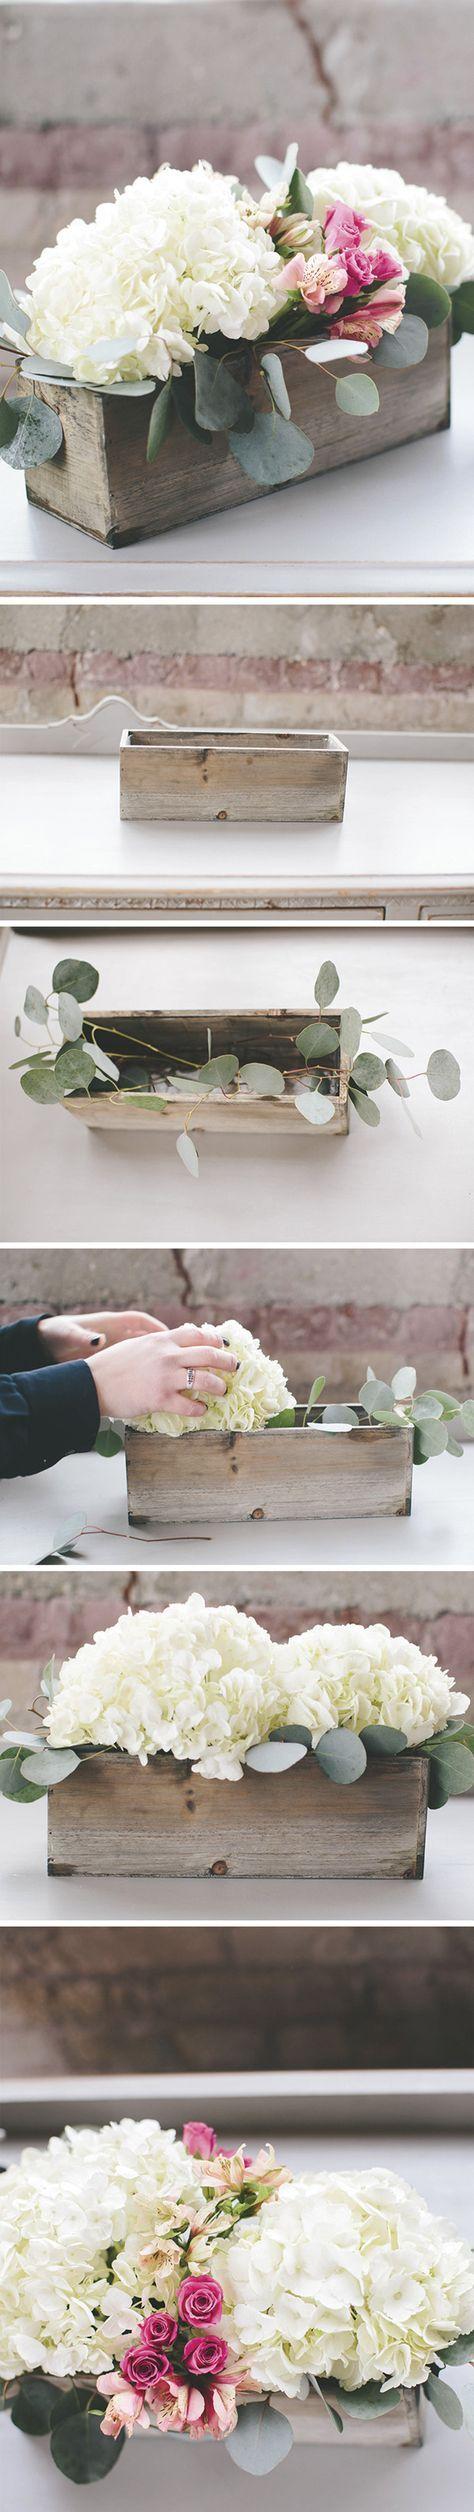 shabby chic diy hydrangea wedding centerpiece ideas